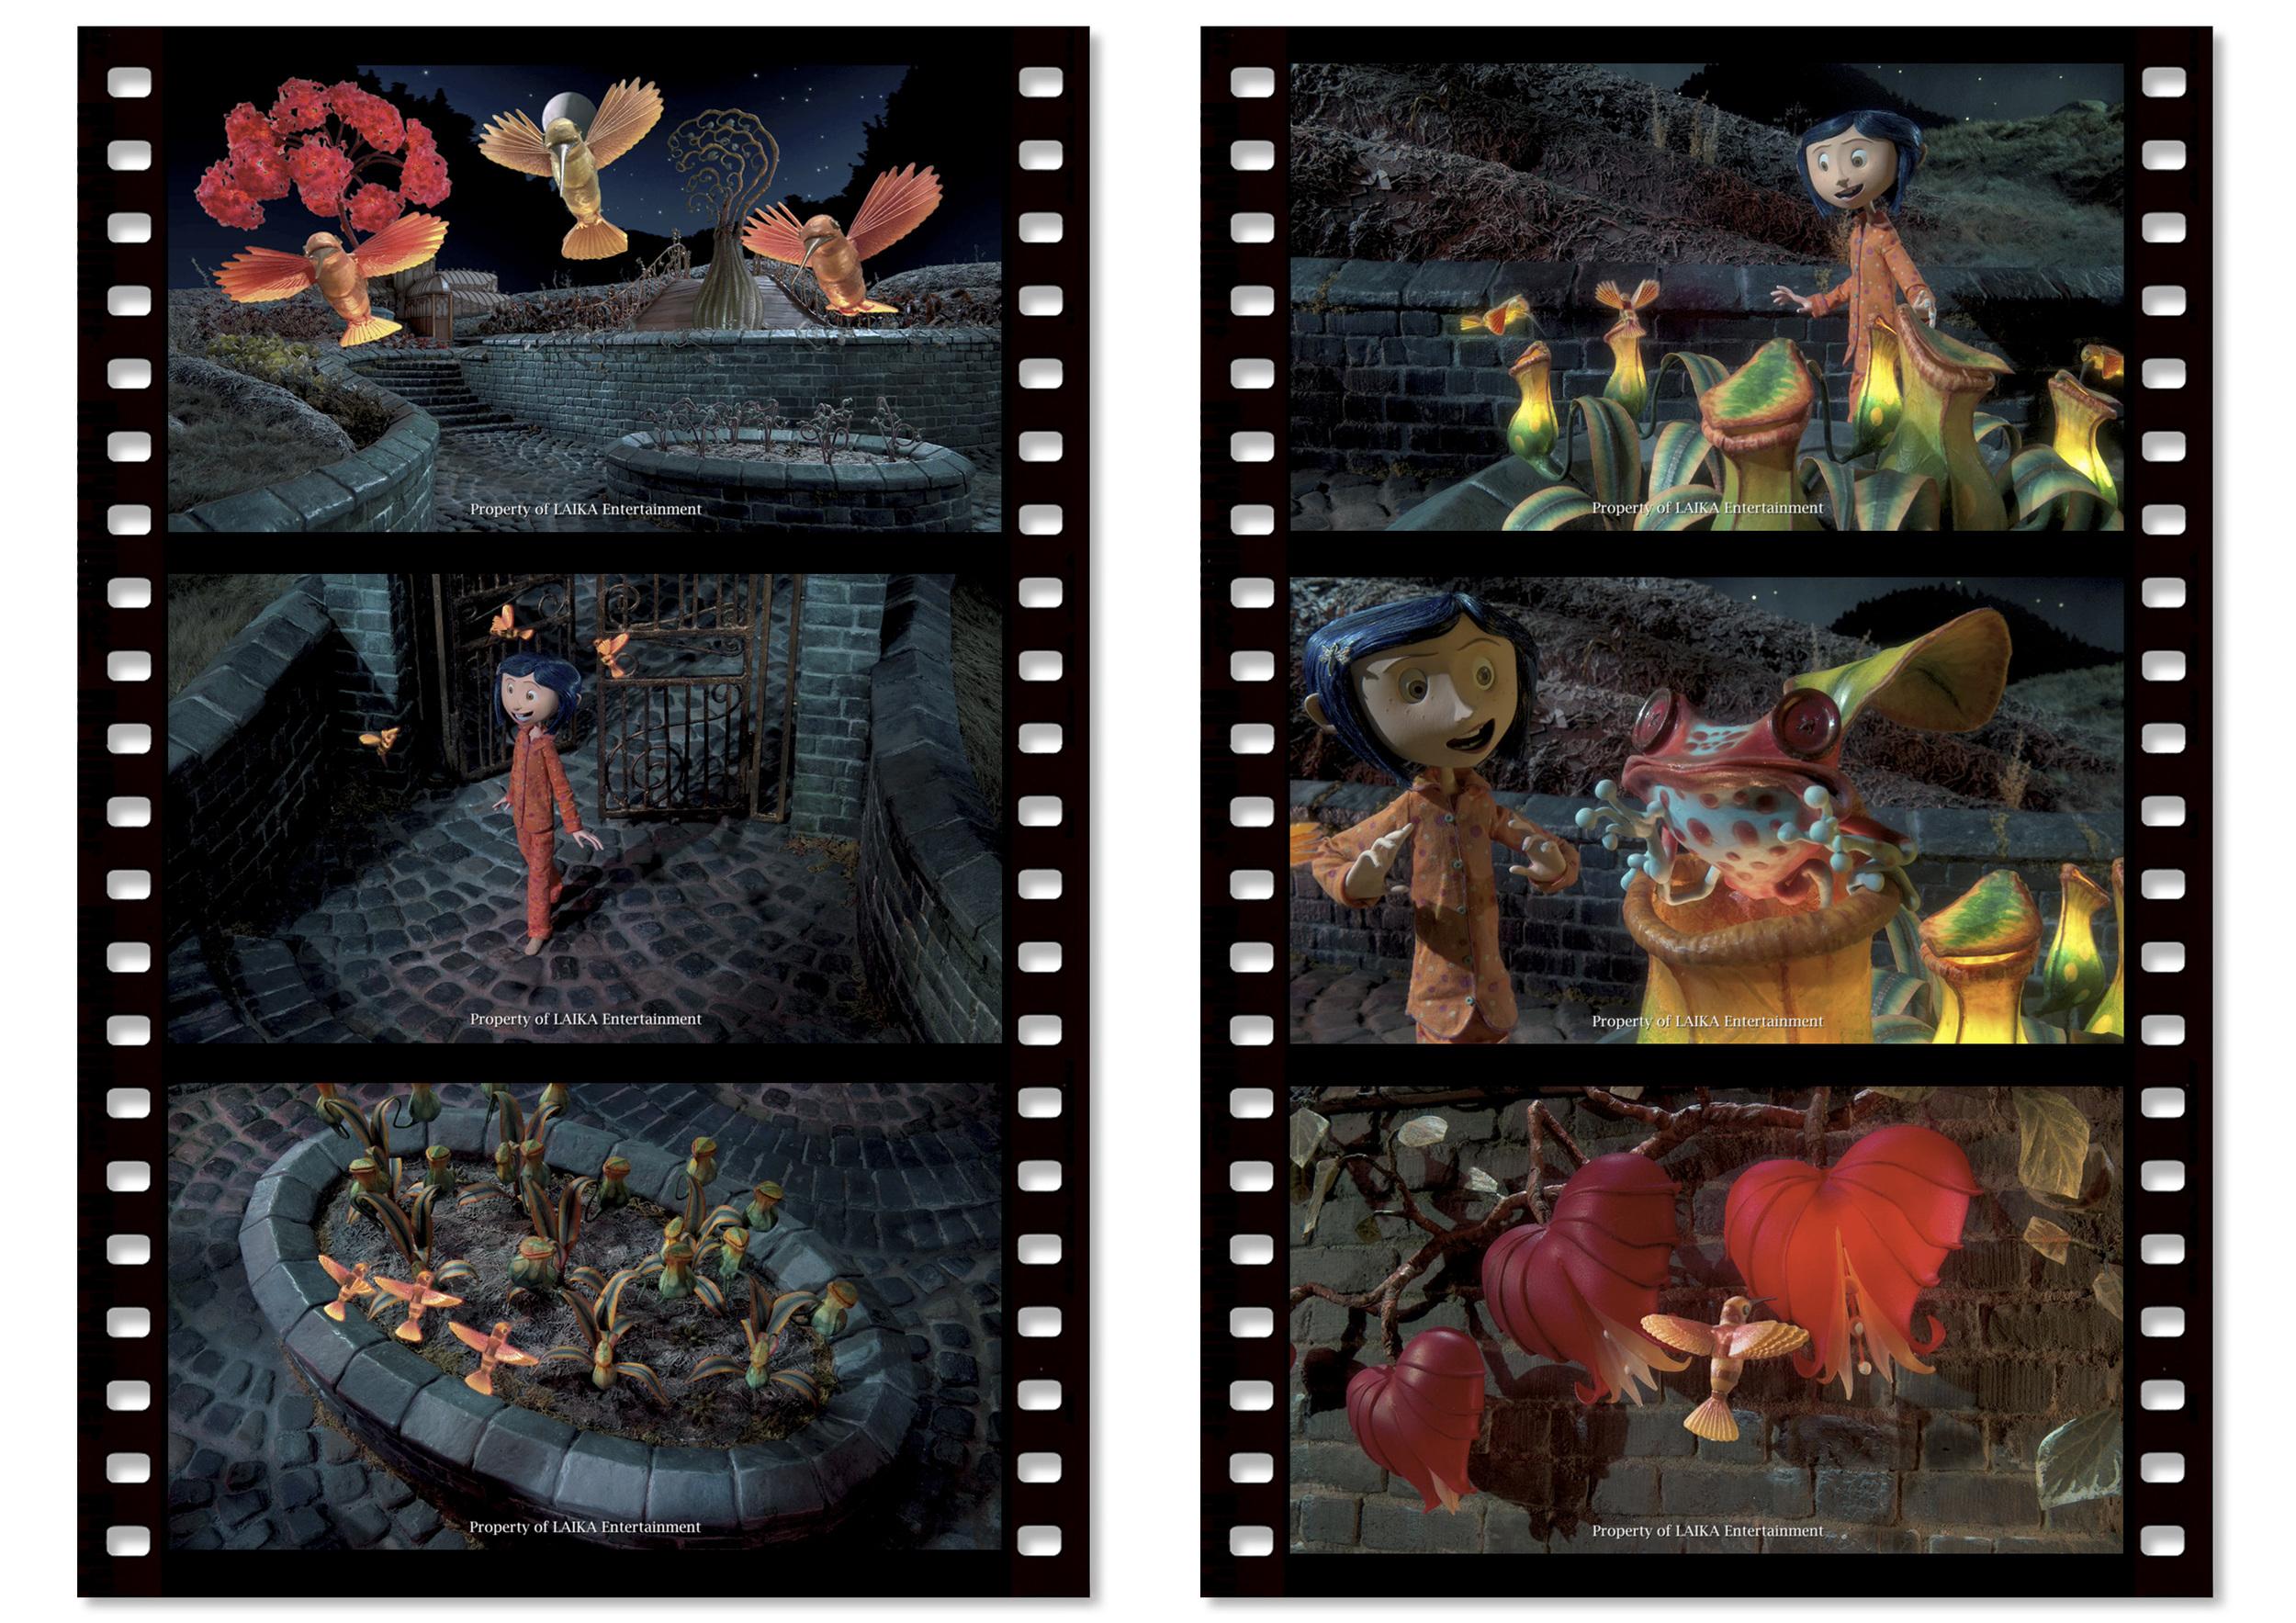 Coraline 6 images 2.jpg